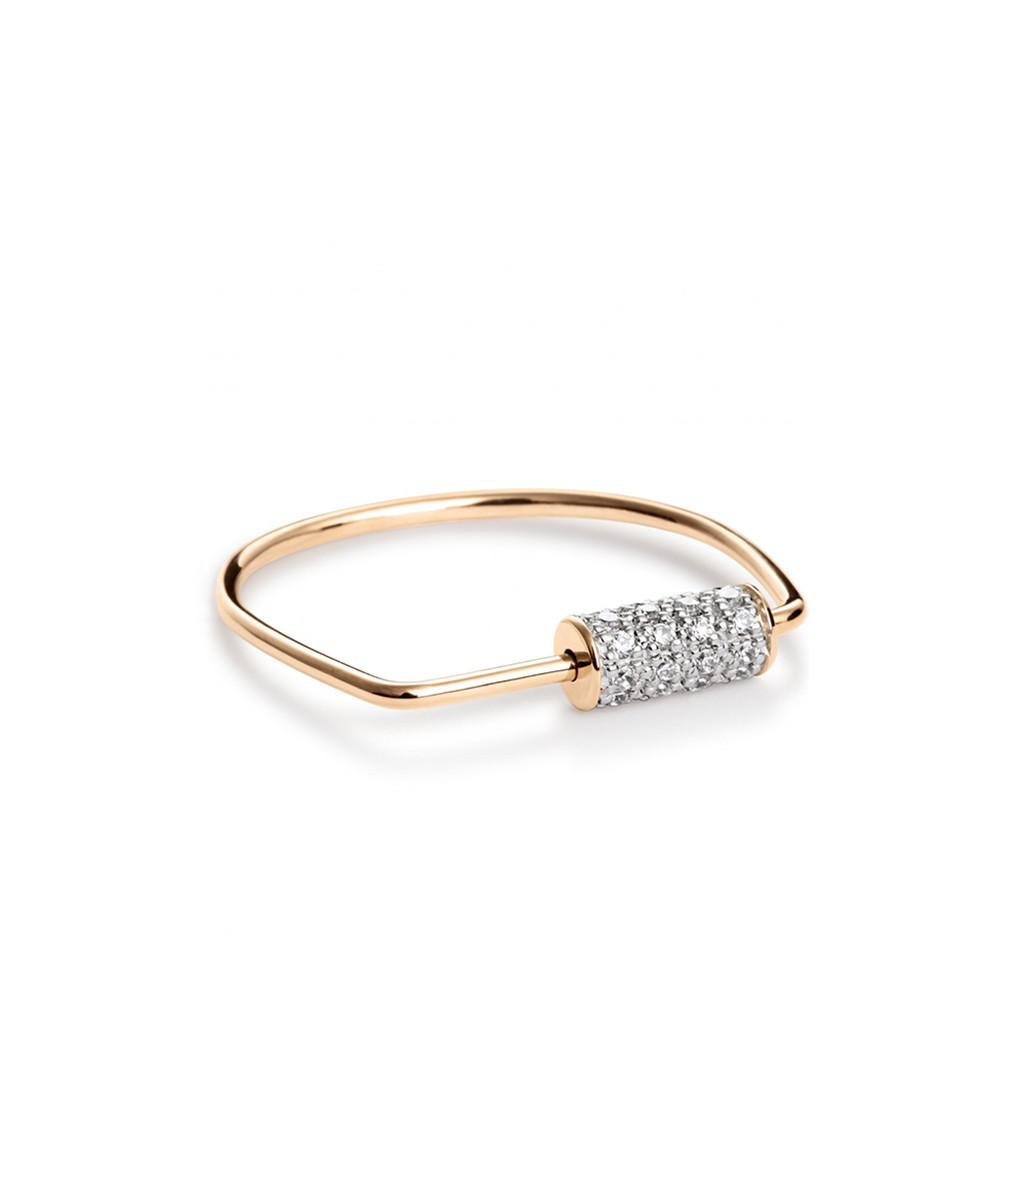 Bague Mini Straw Diamond - GINETTE_NY